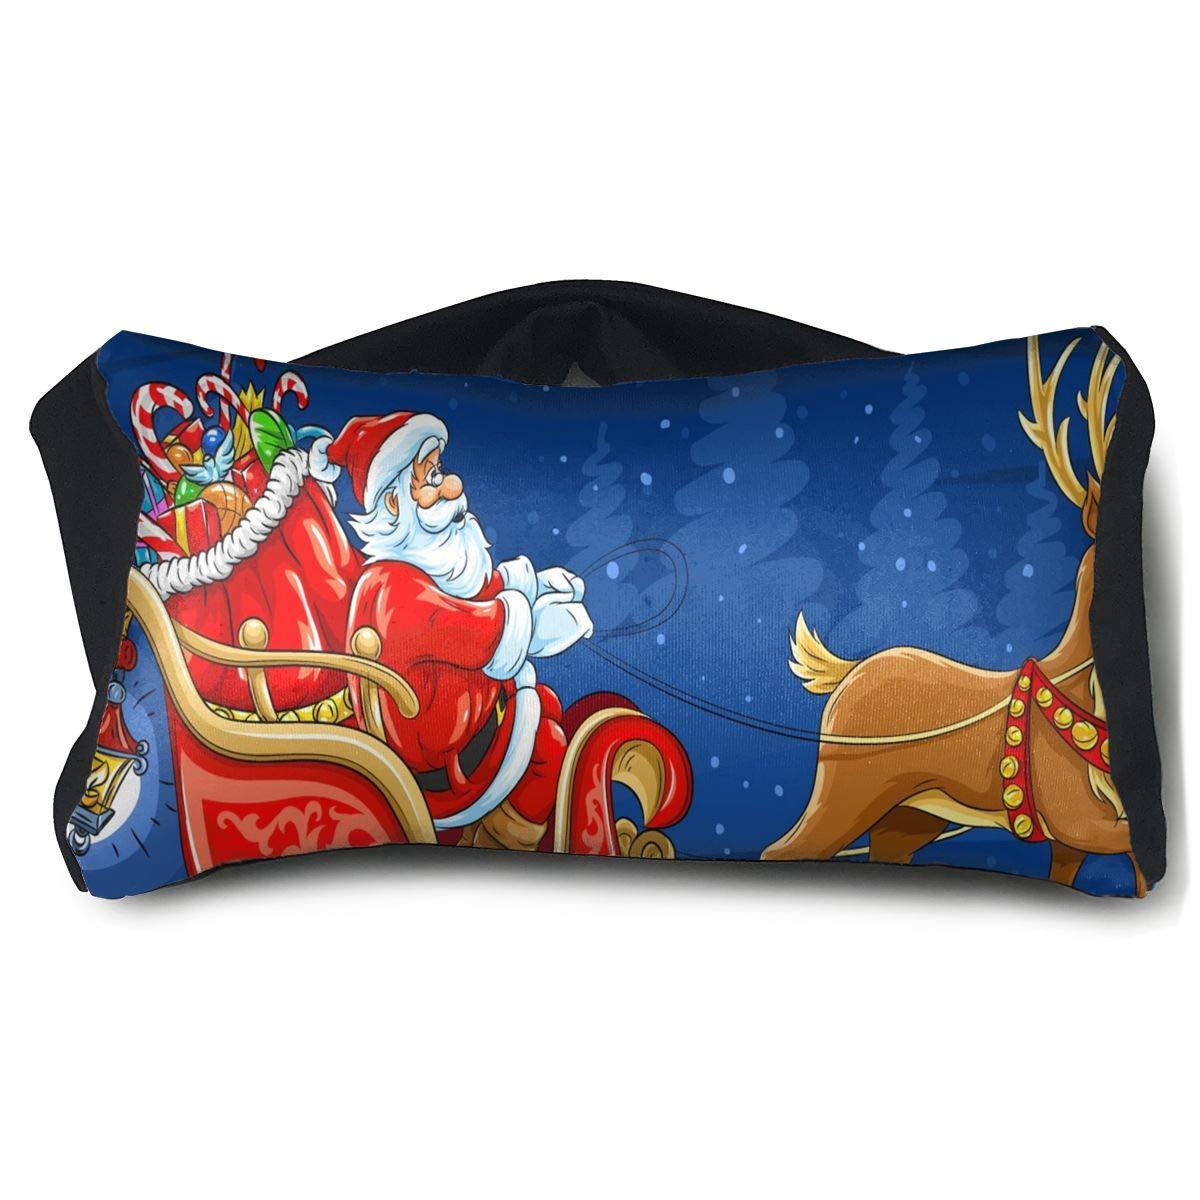 Eye Pillow Santa Sleigh Christmas Holiday Deer Special Mens Portable Blindfold Train Sleep Eye Bag Bed